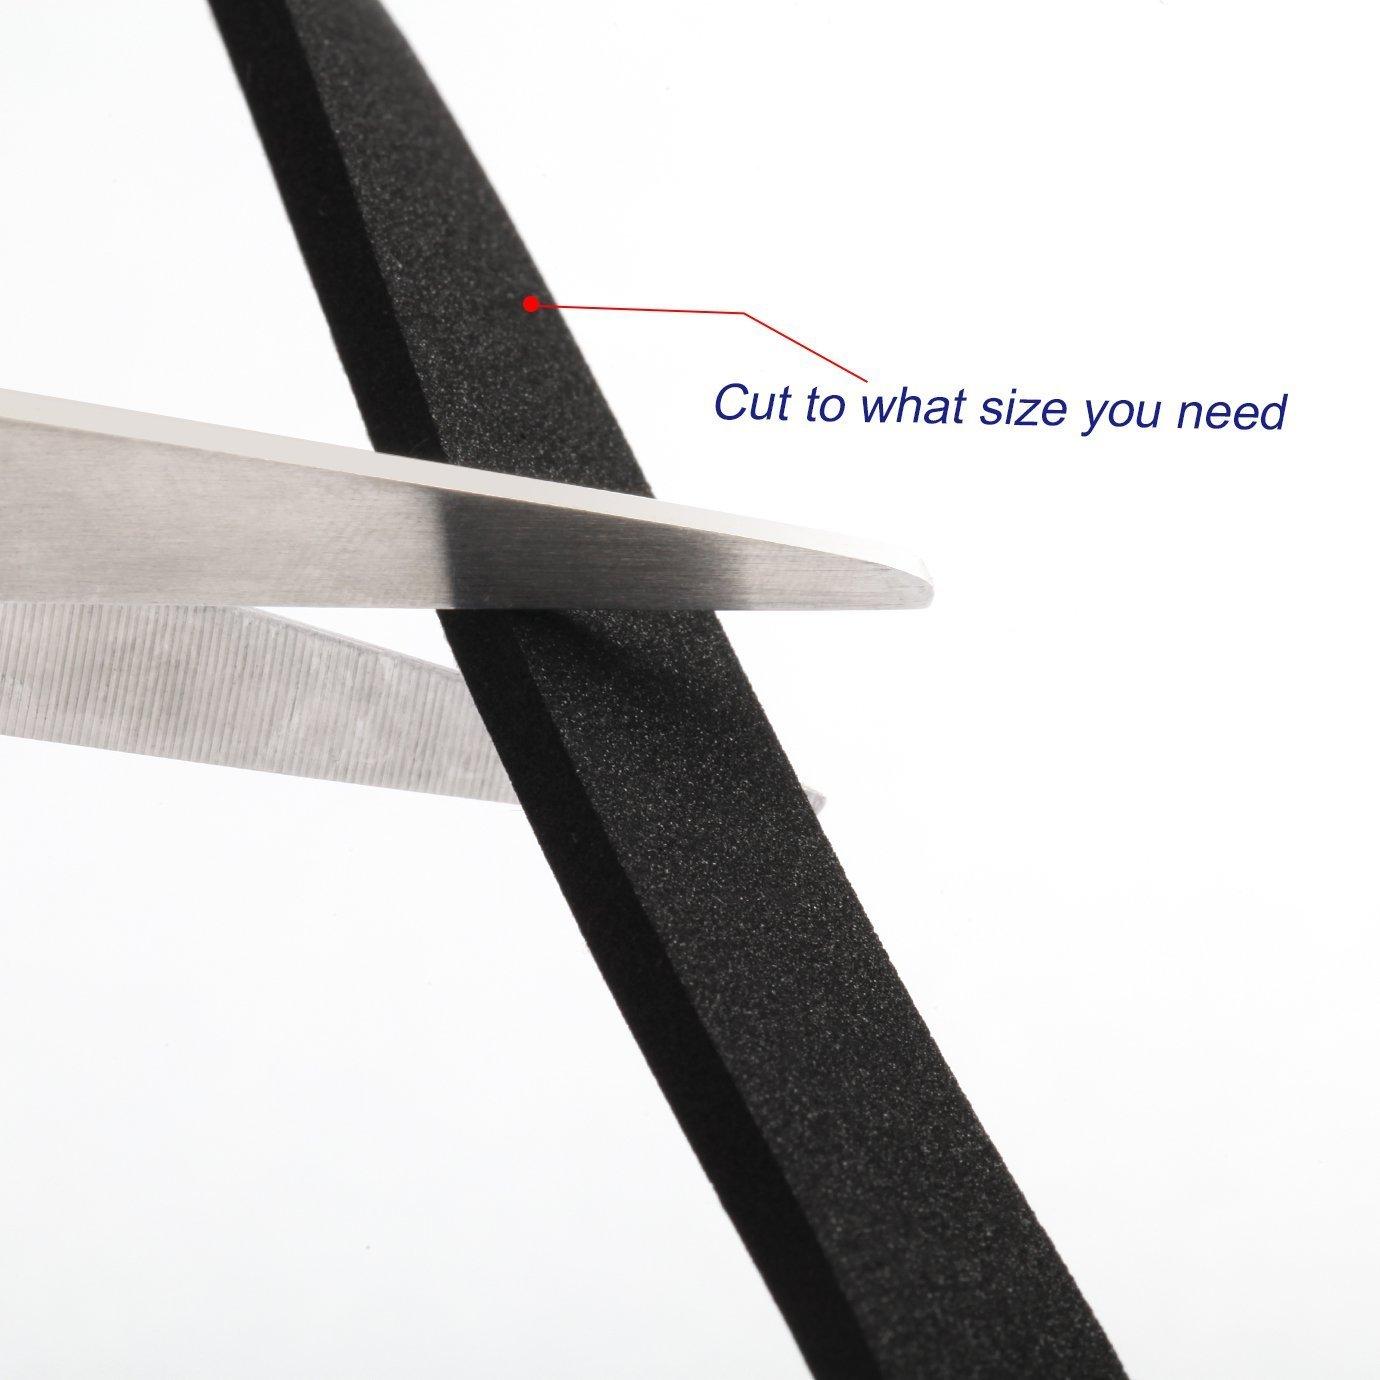 XCSSKG - Tira de Sellado de Espuma de Alta Densidad autoadhesiva para la Intemperie (1,5 cm de Ancho x 3 mm de Grosor x 5 m de Largo): Amazon.es: Hogar